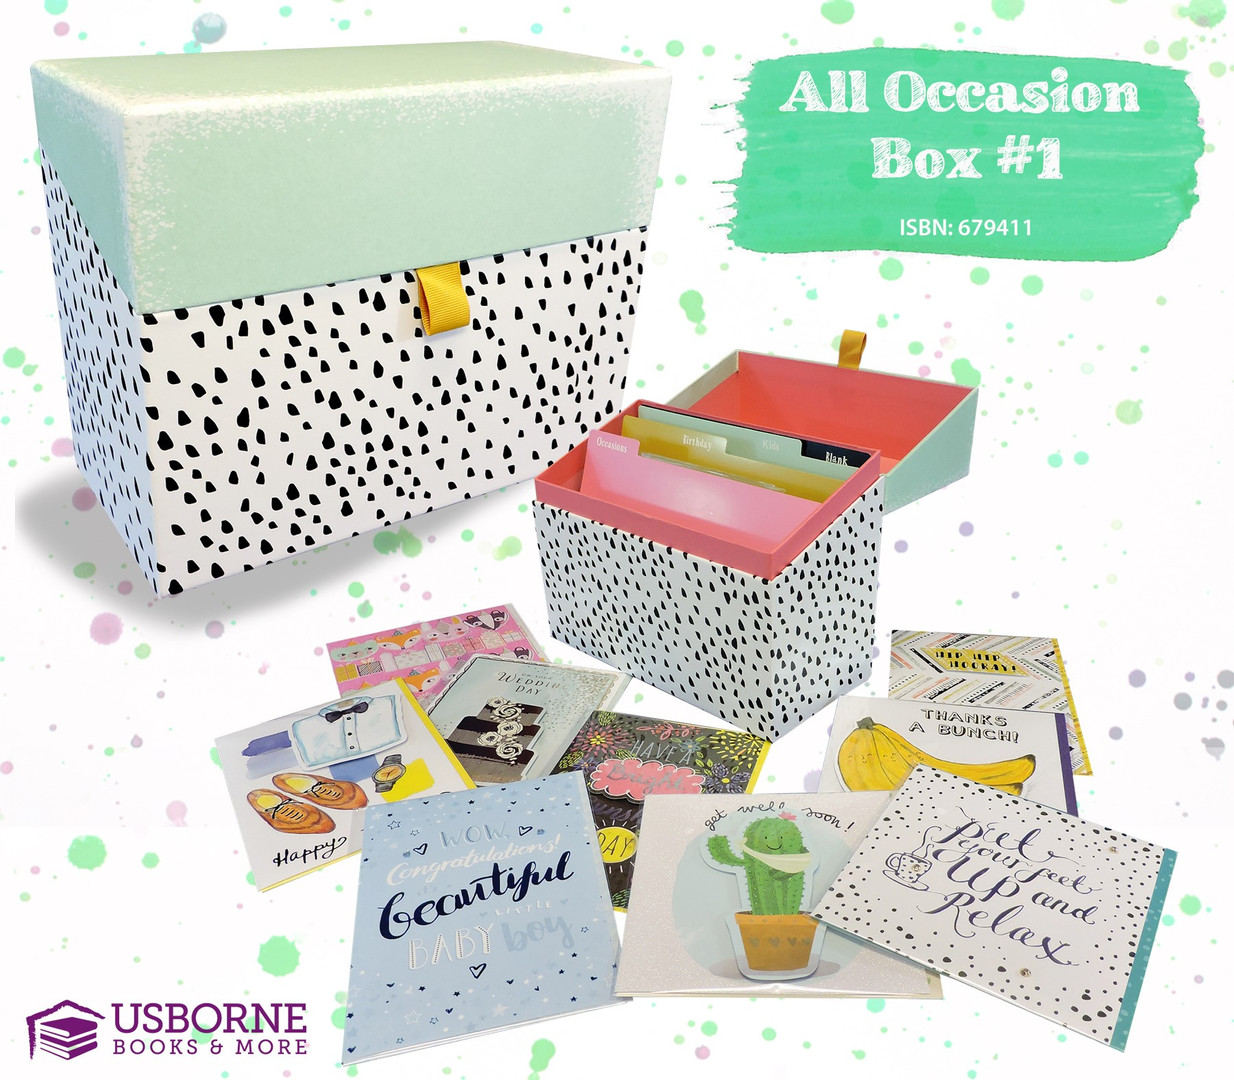 All Ocassion Box #1